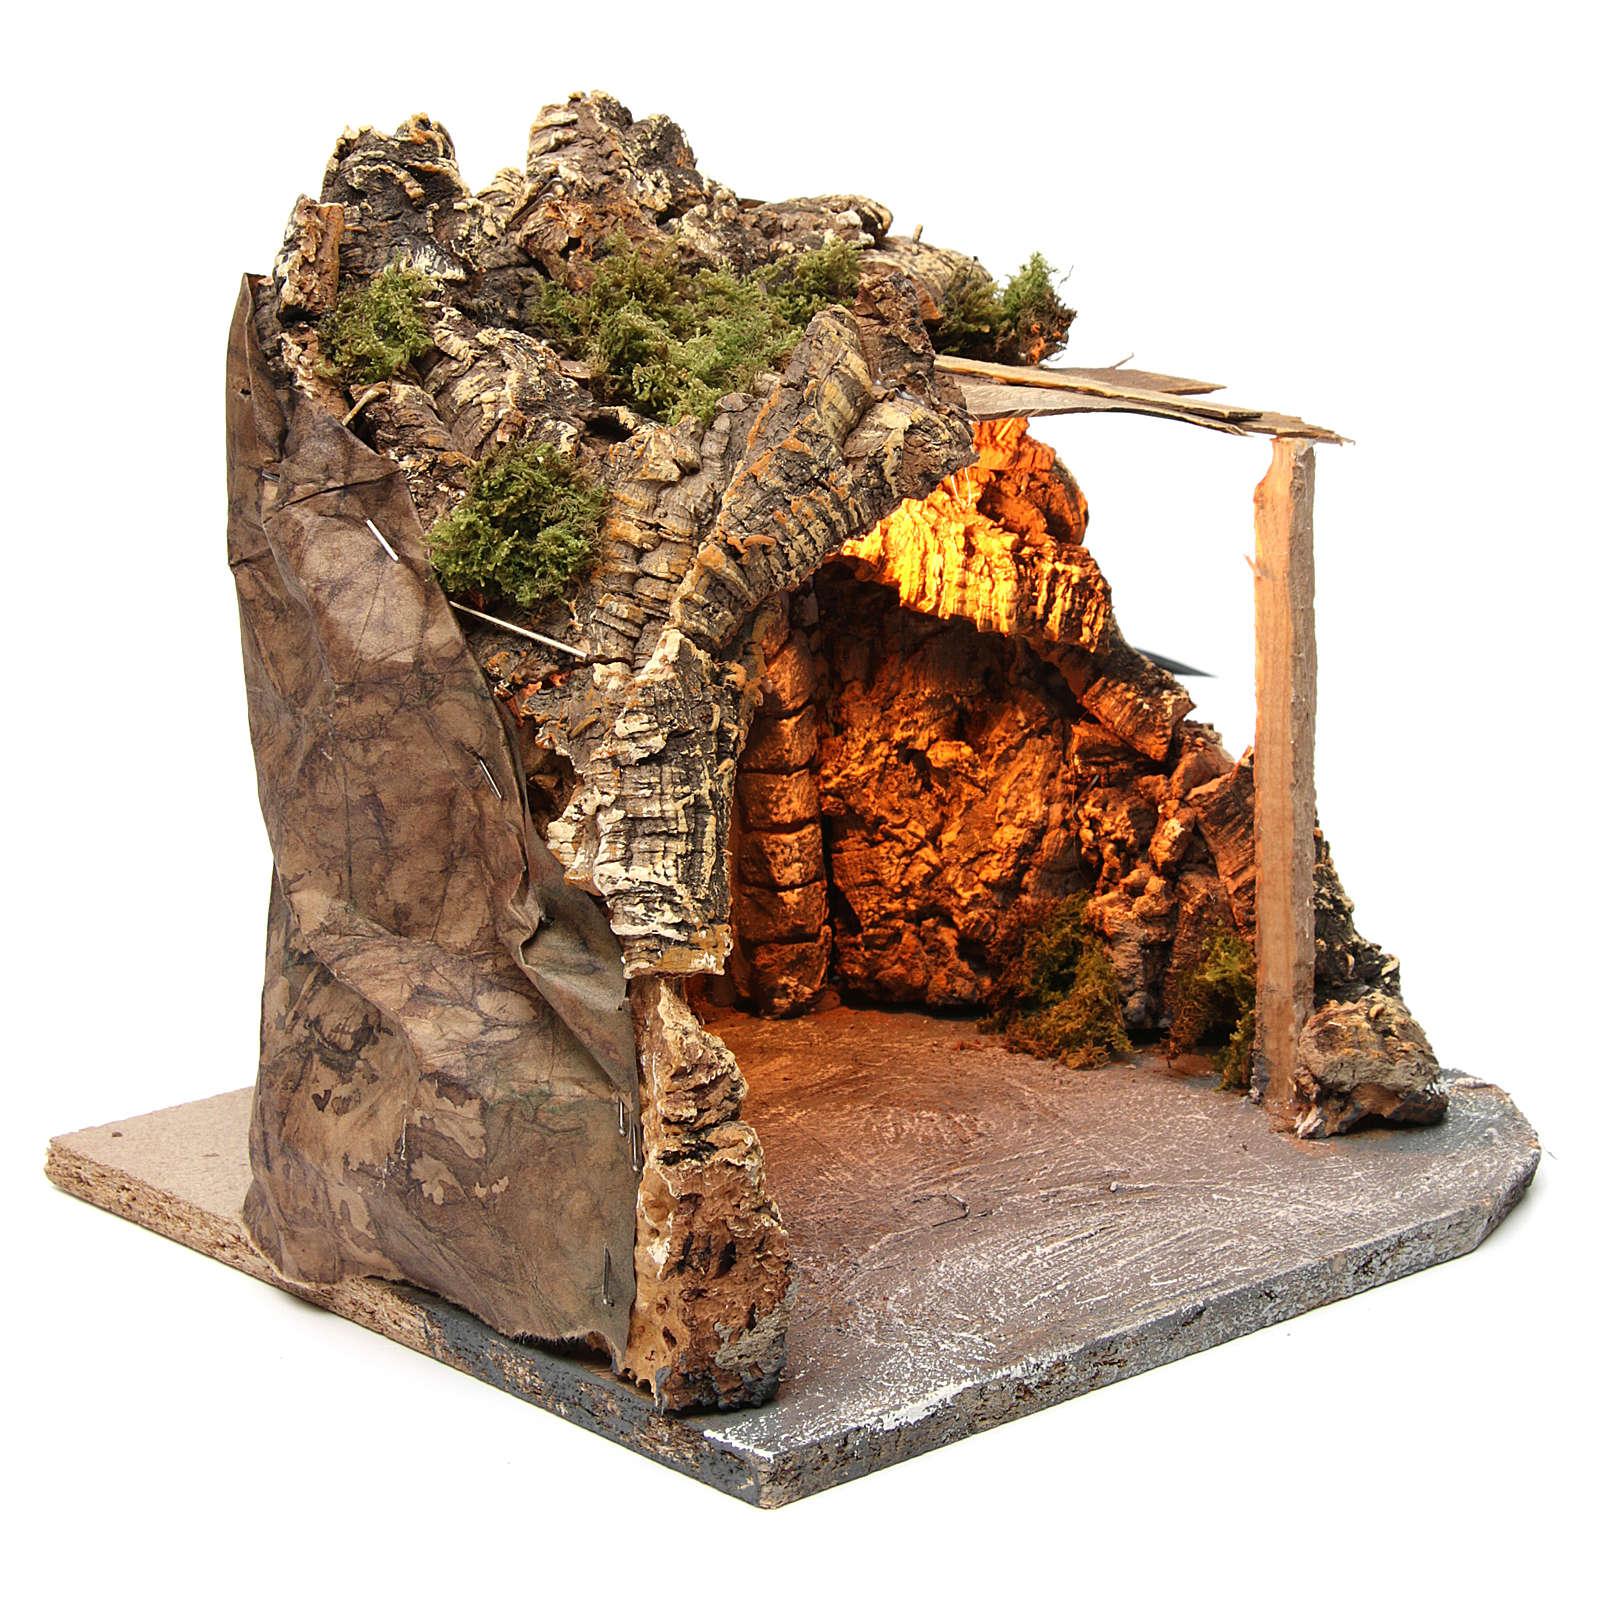 Illuminated hut with porch in wood and cork for Neapolitan Nativity Scene 25x30x25 cm 4